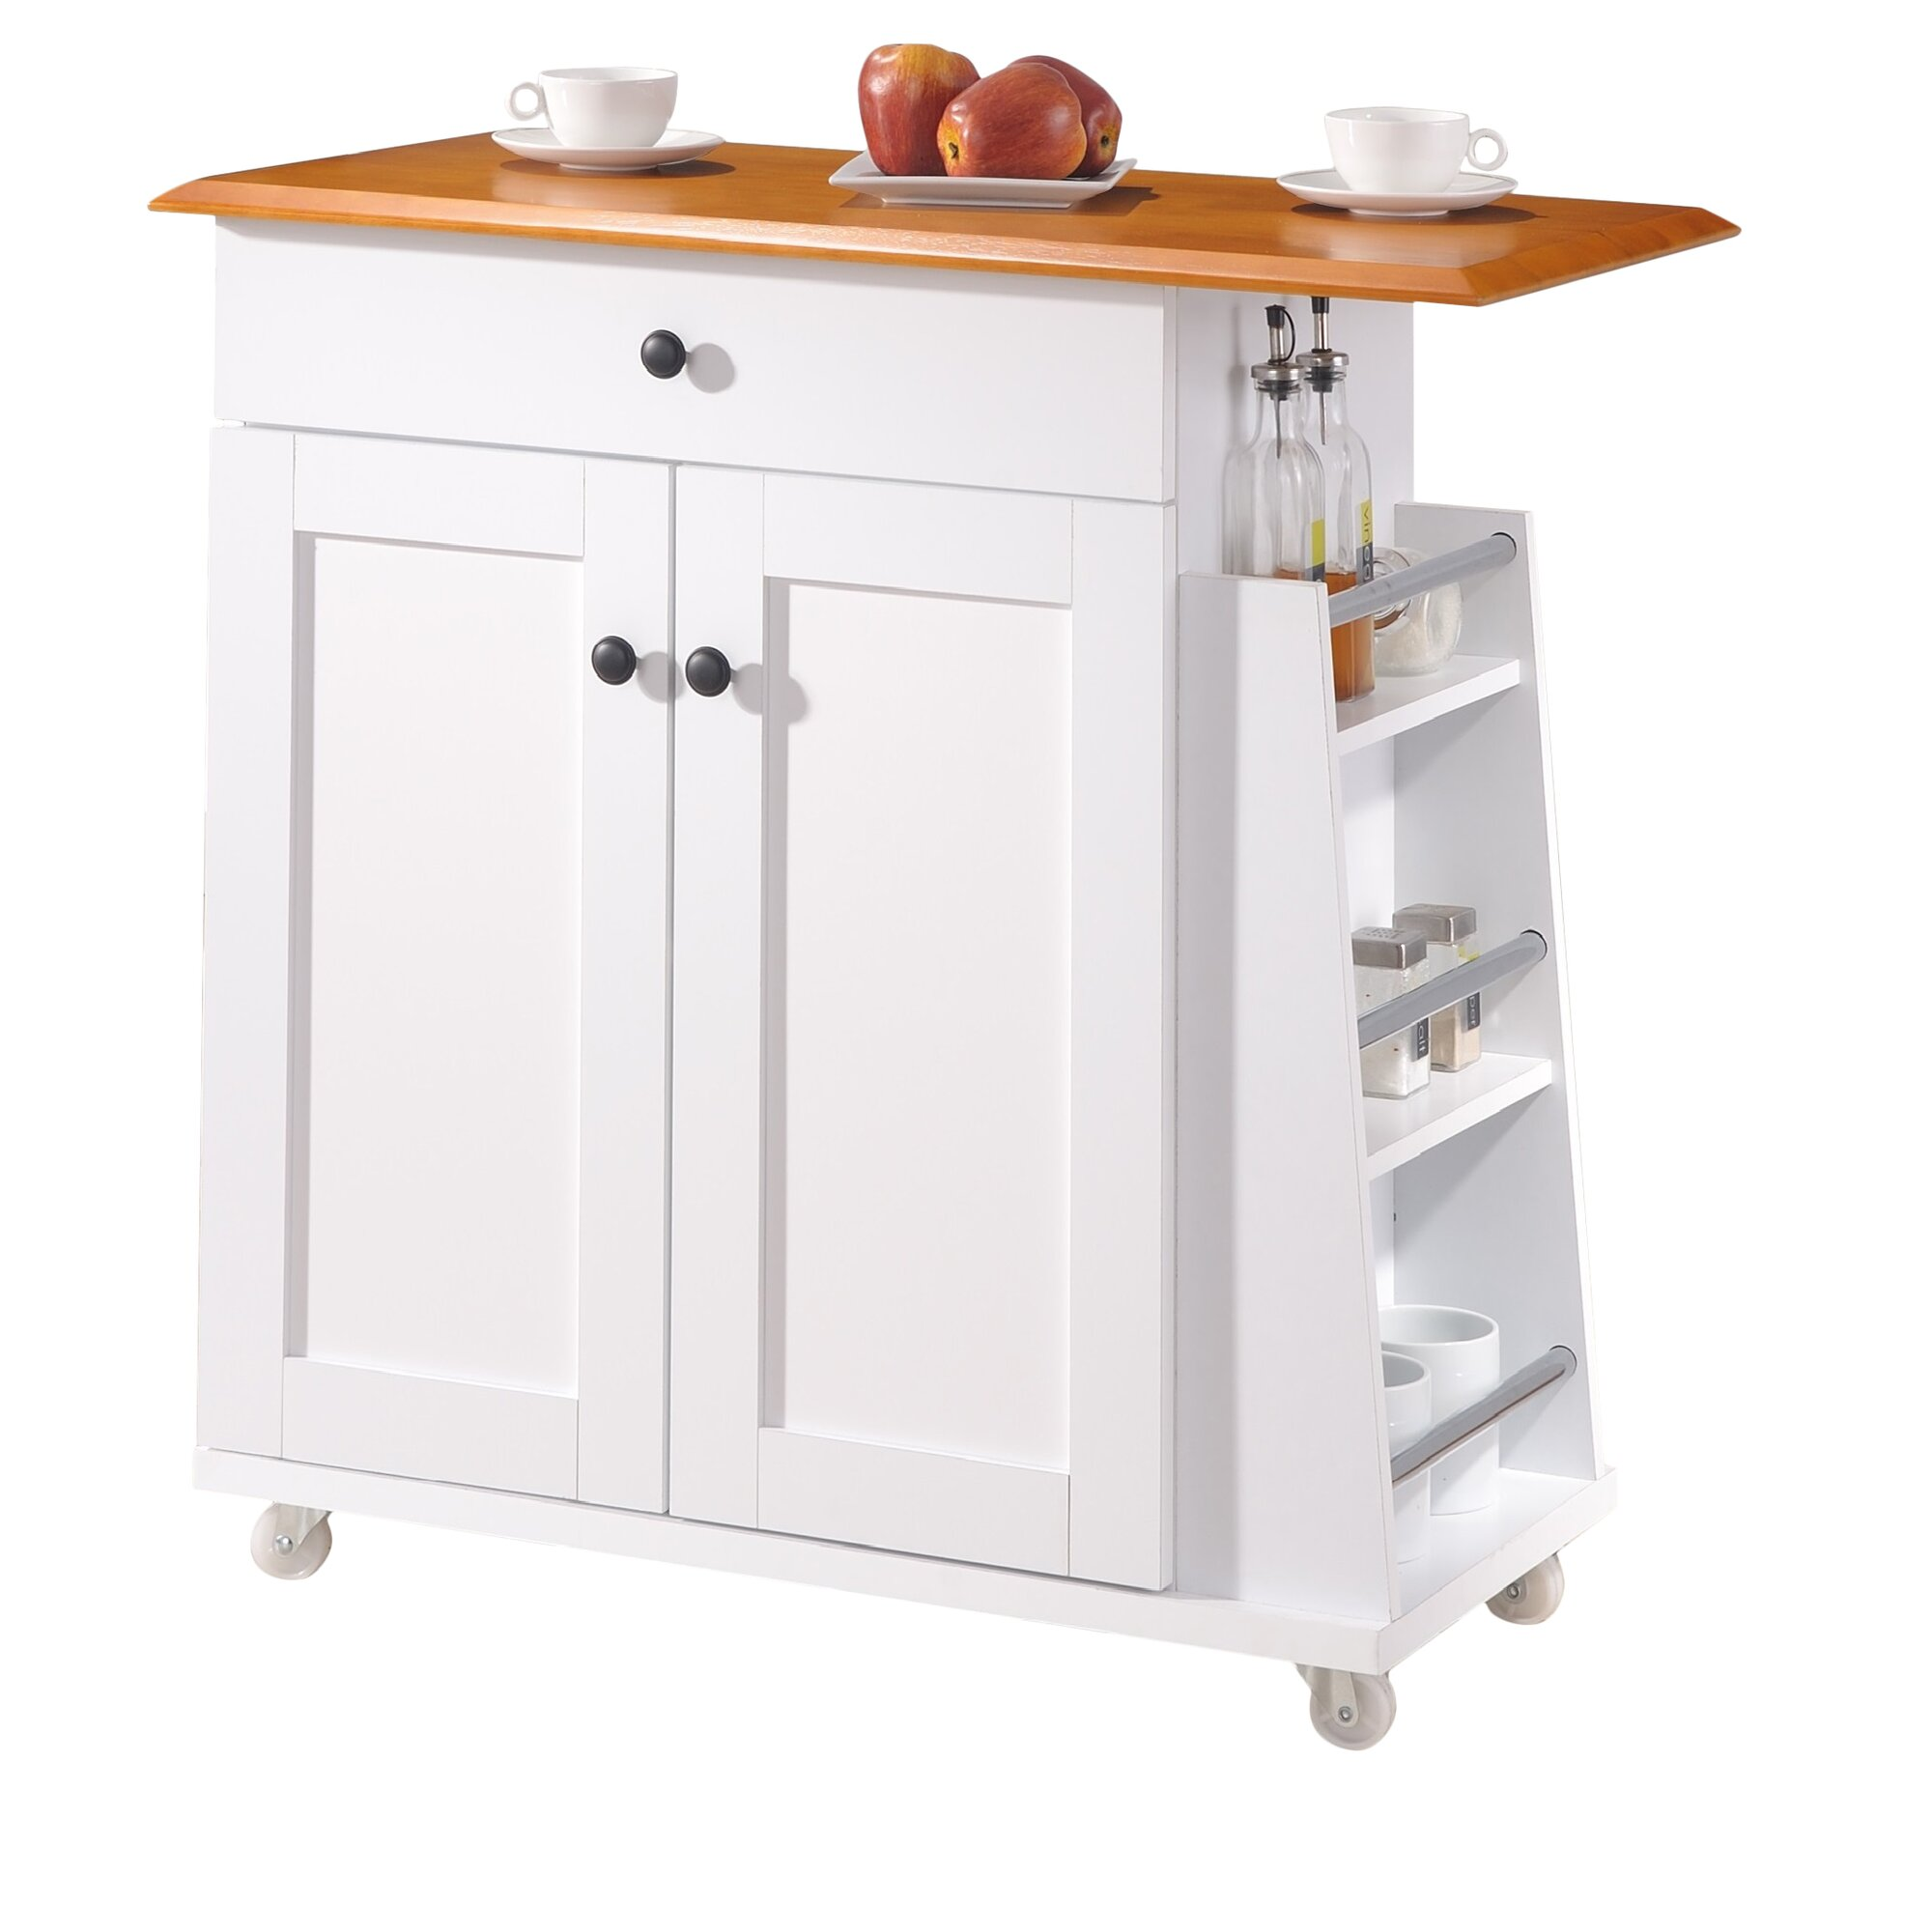 Wholesale Interiors Baxton Studio Kitchen Cart Reviews Wayfair